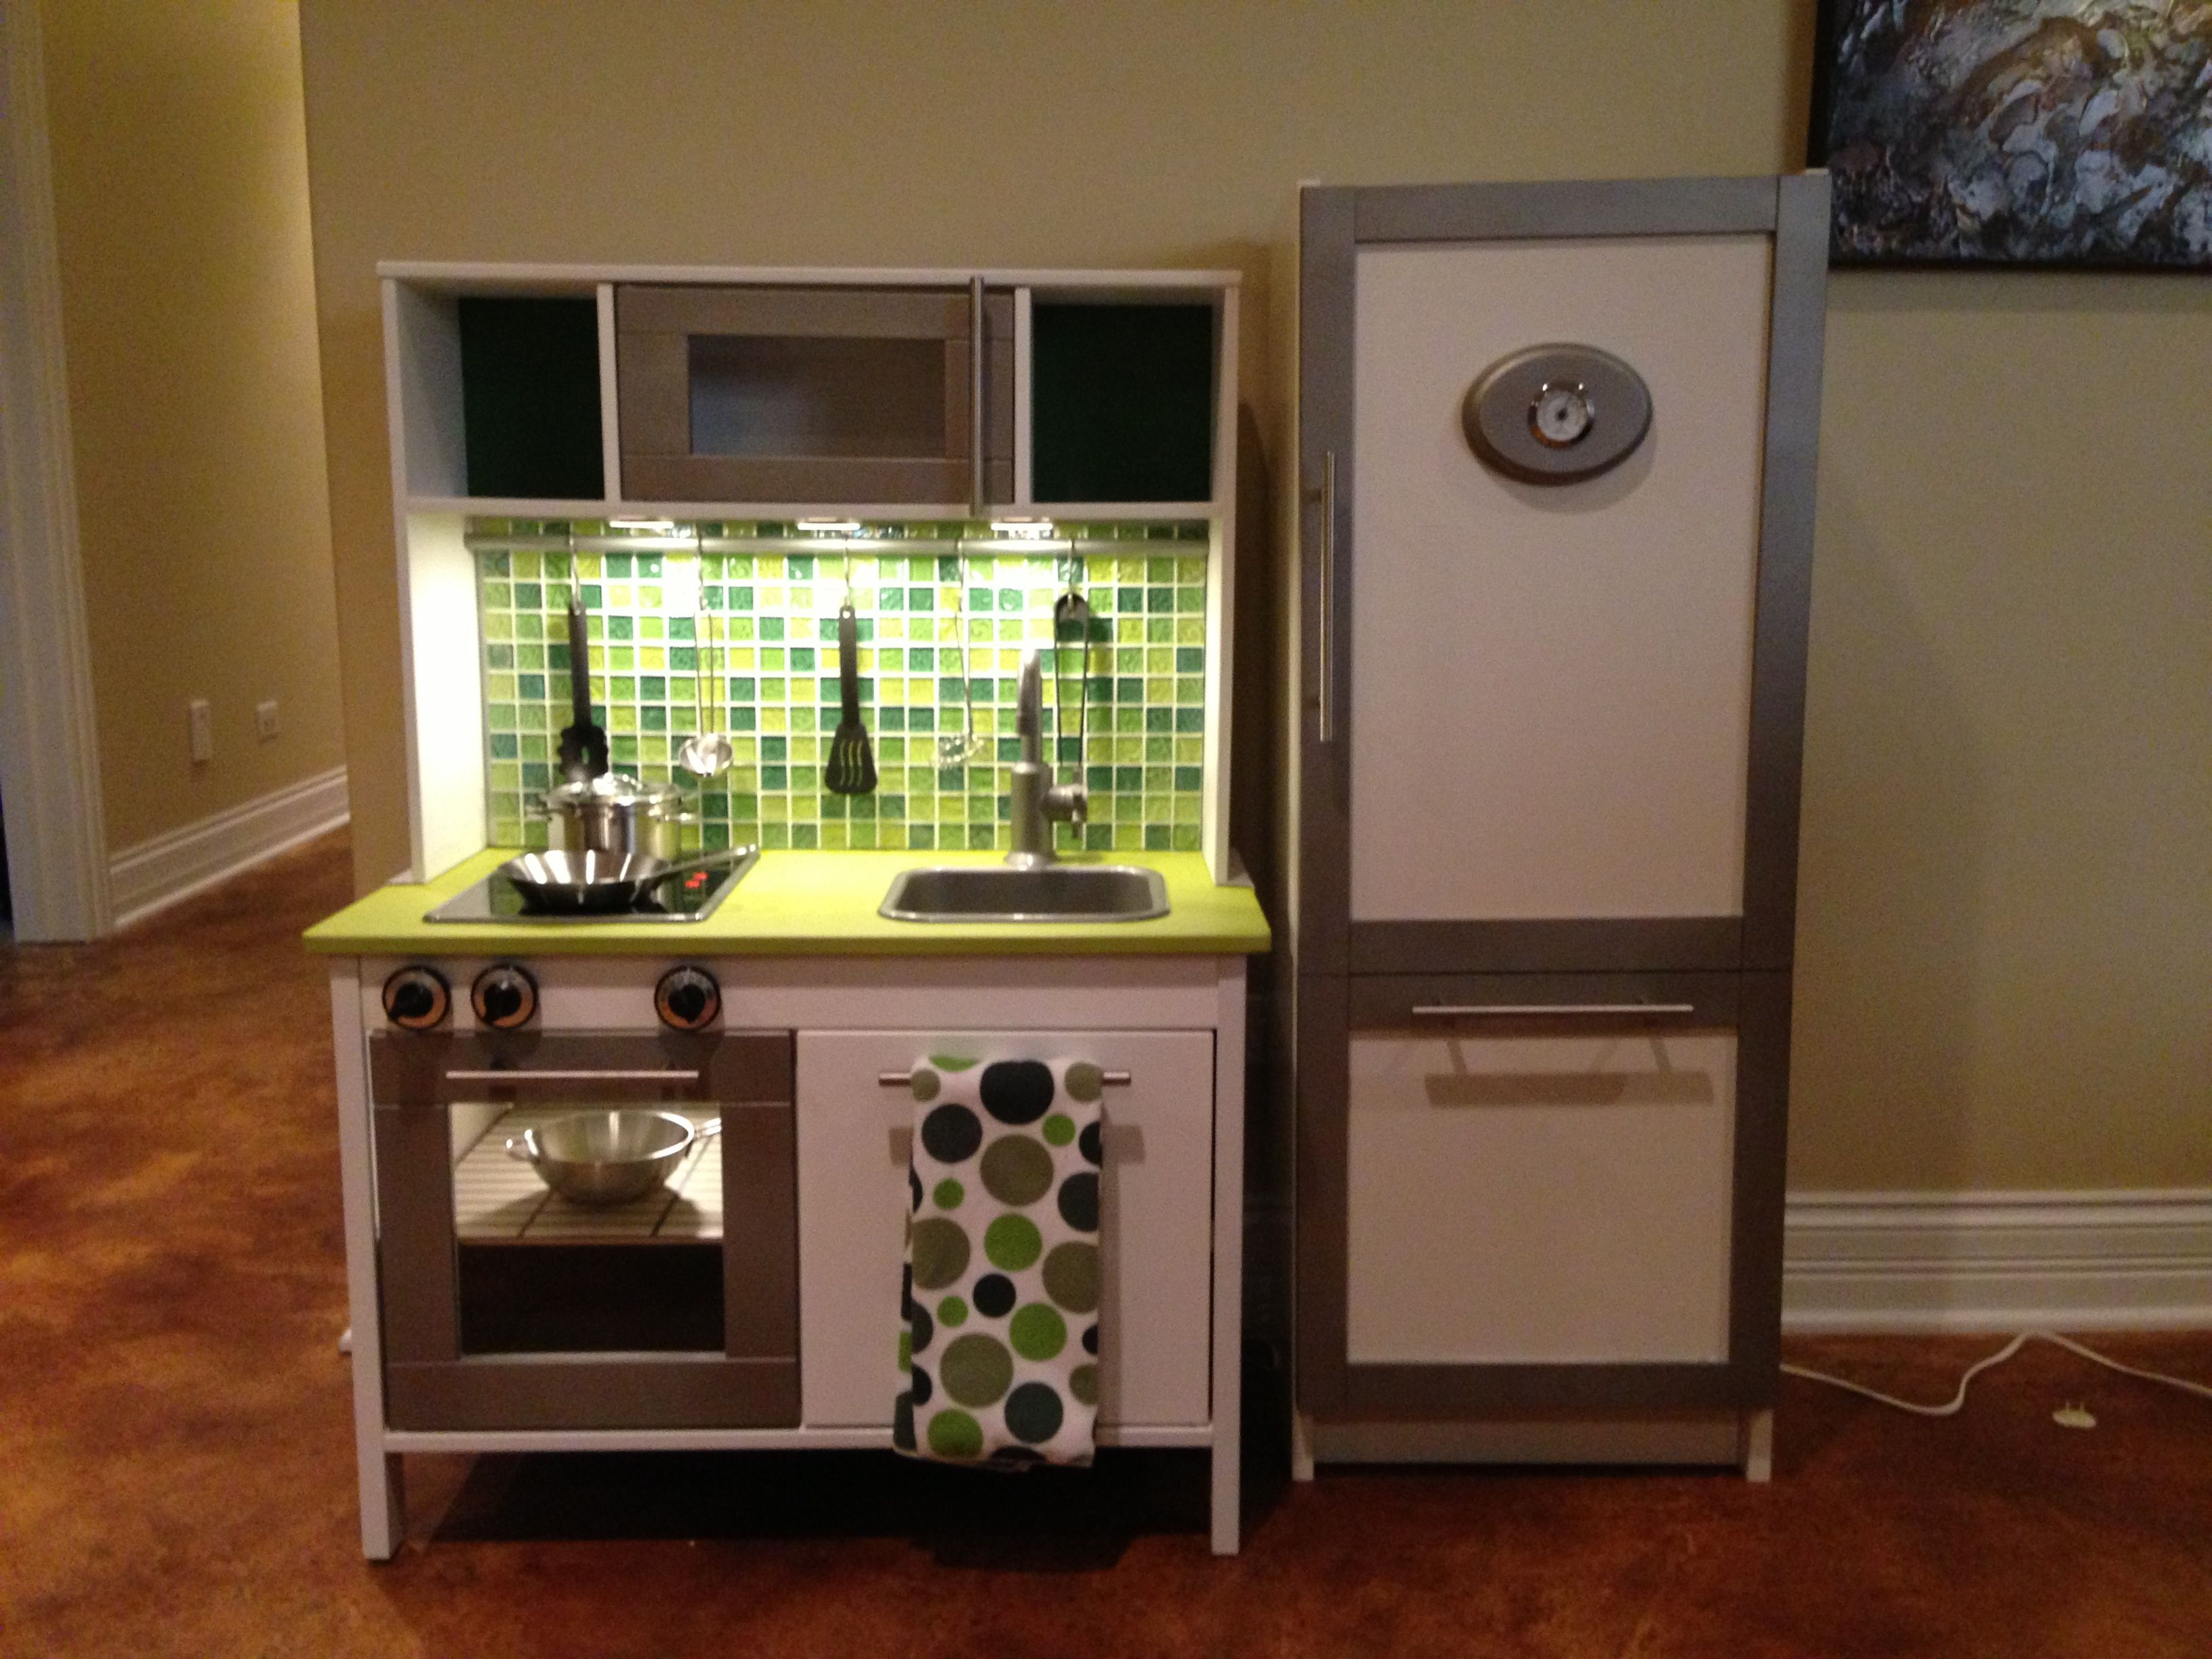 Minibar Kühlschrank Ikea : Ikea mini kühlschrank miniküche mit kühlschrank jcooler